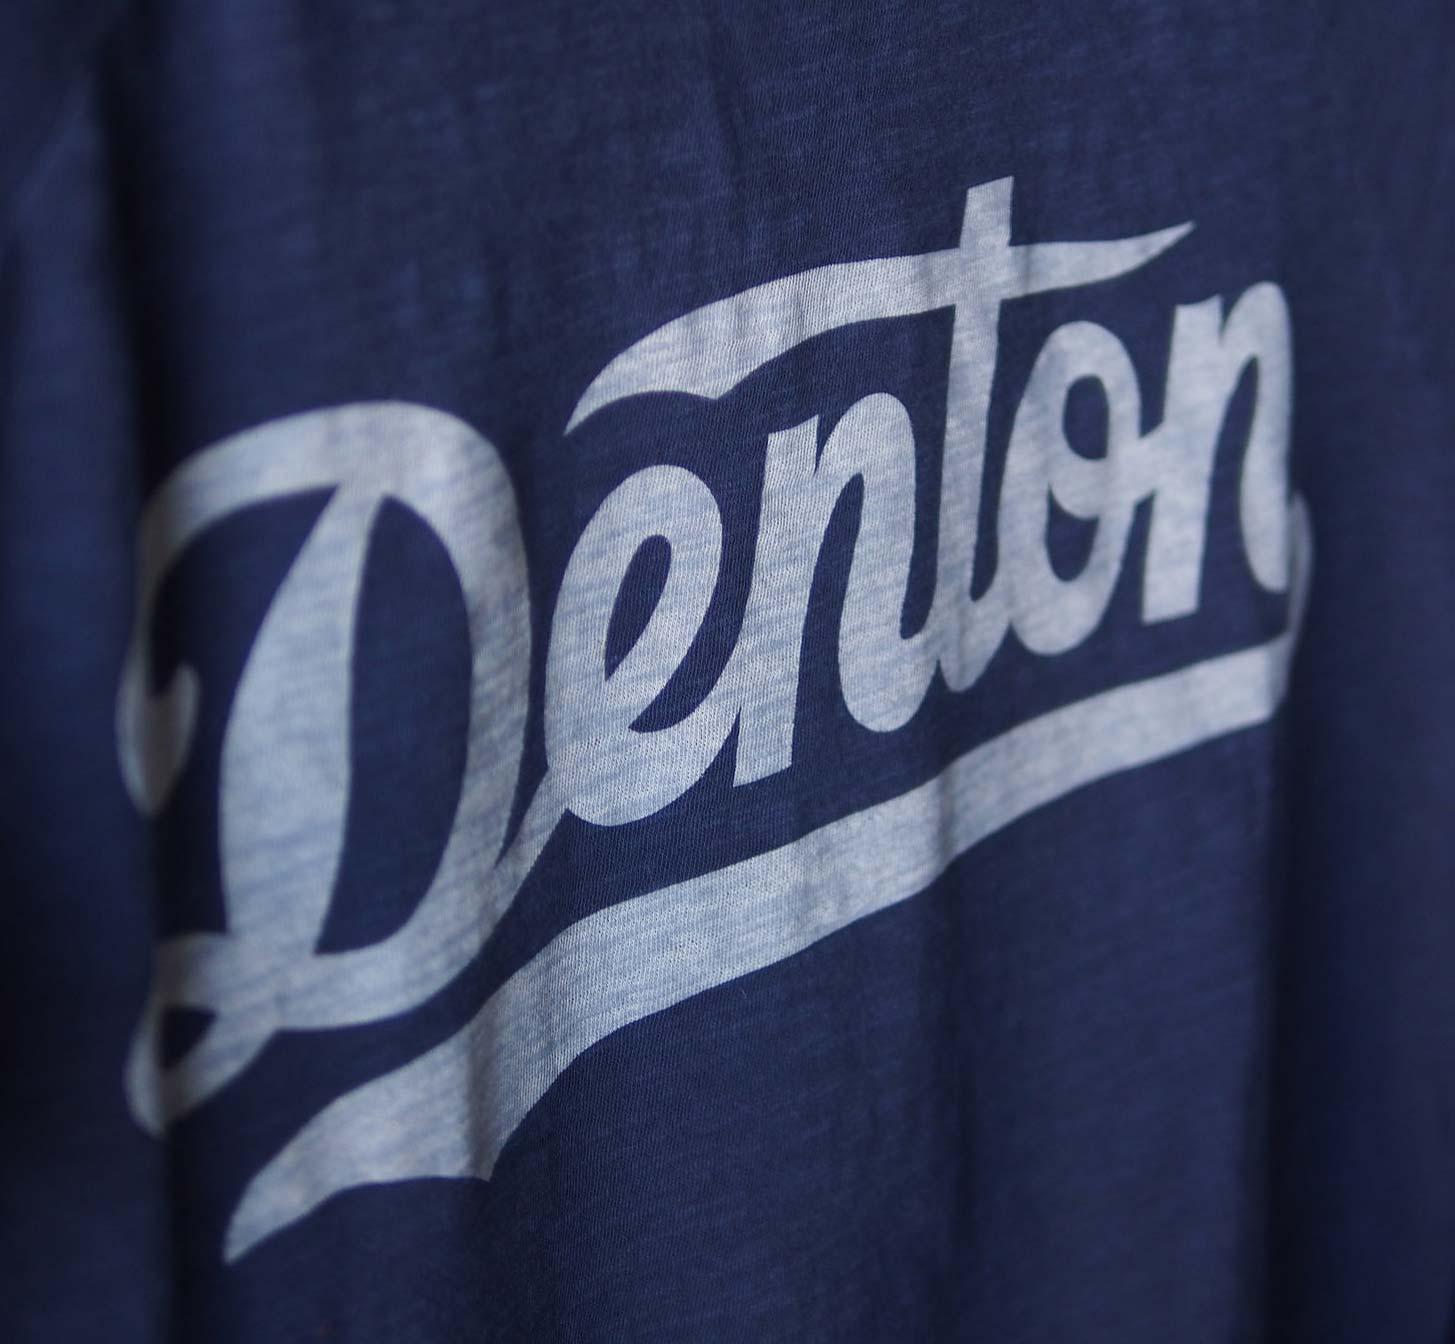 denton-shirt-closeup.jpg